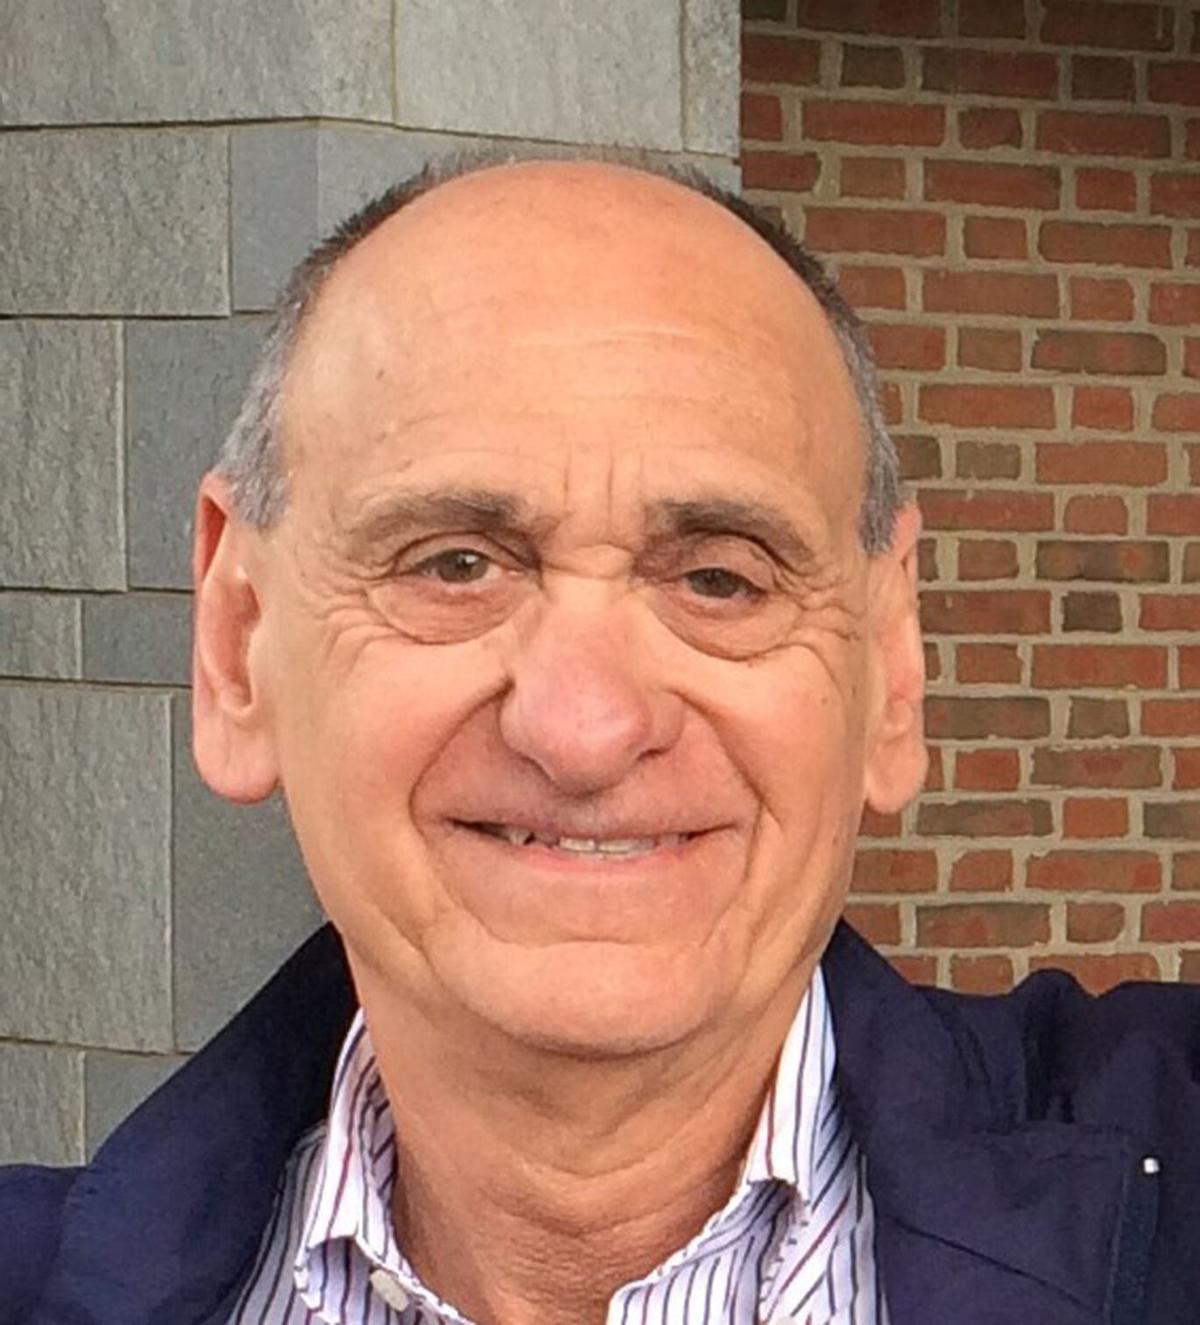 Tony Sclama, author, surgeon